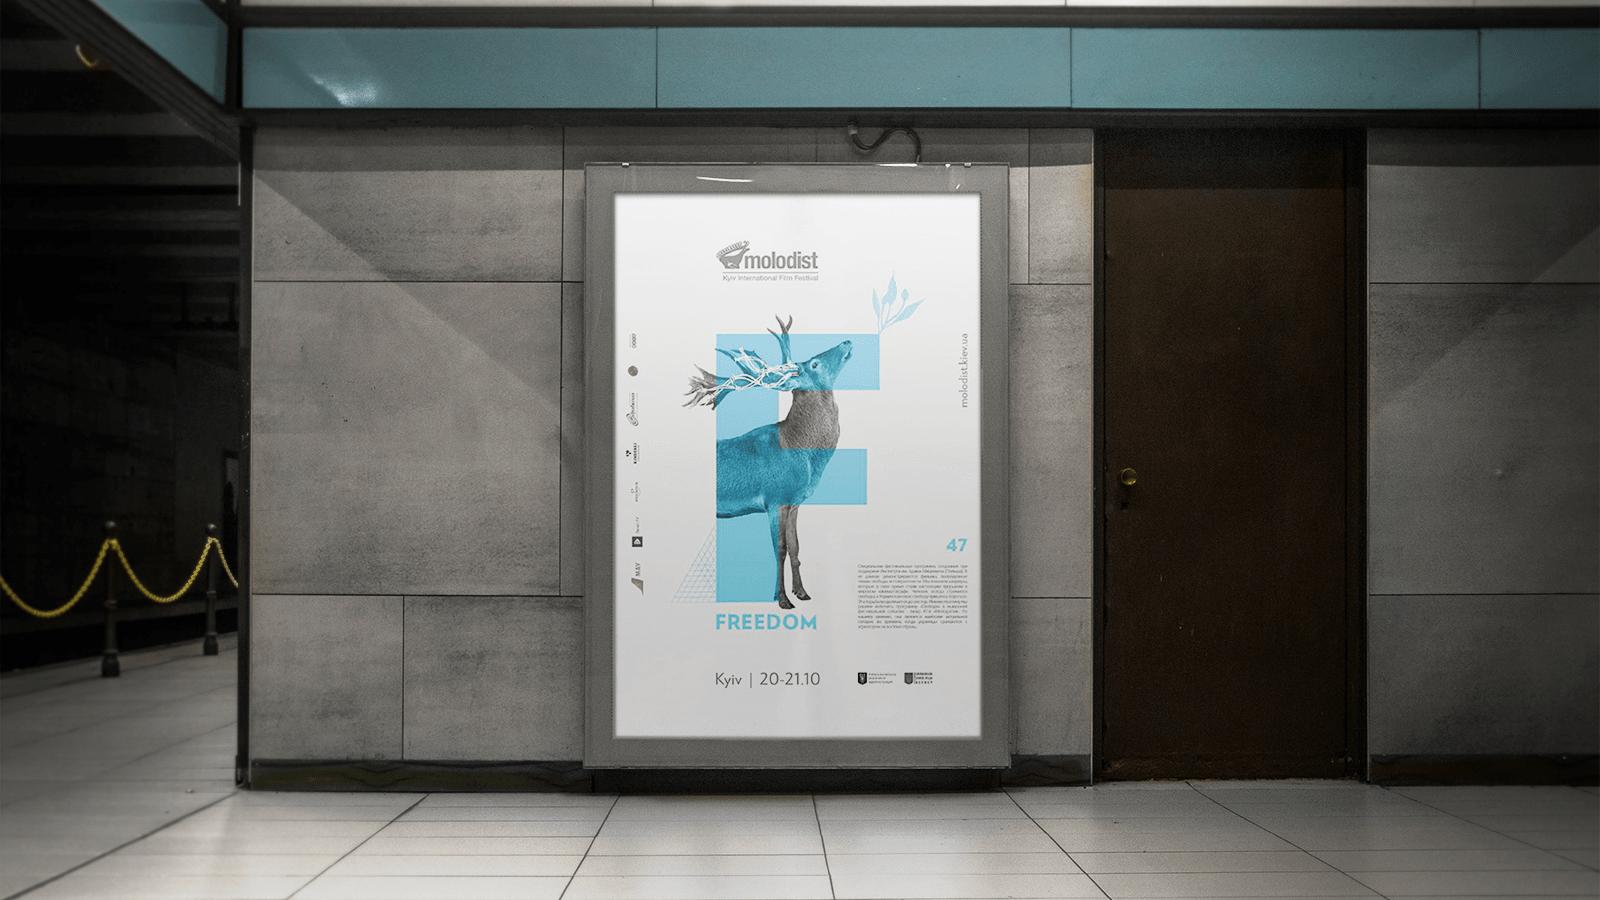 разработка и продвижение бренда